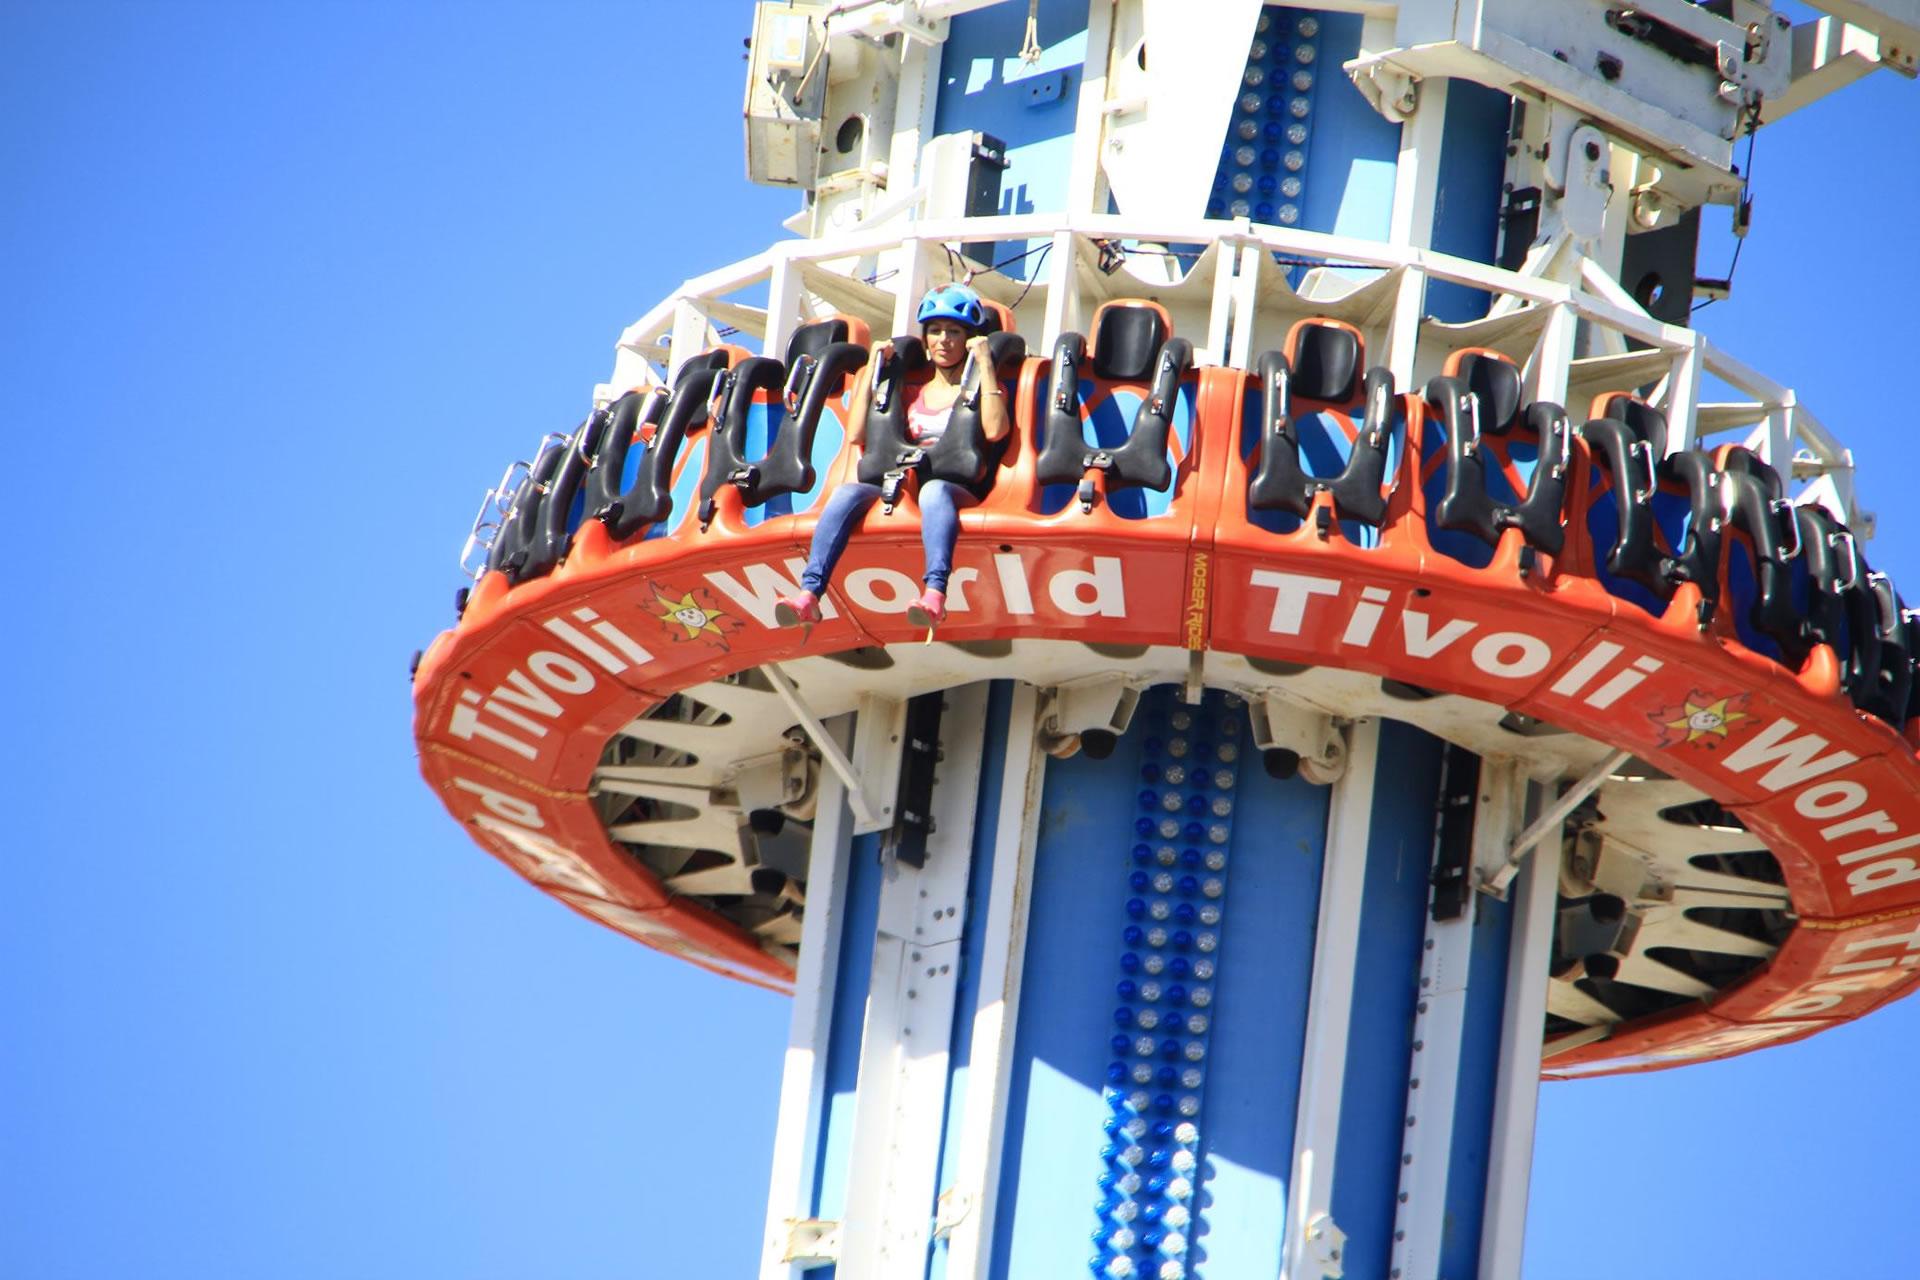 Tivoli World amusement park in Benalmadena